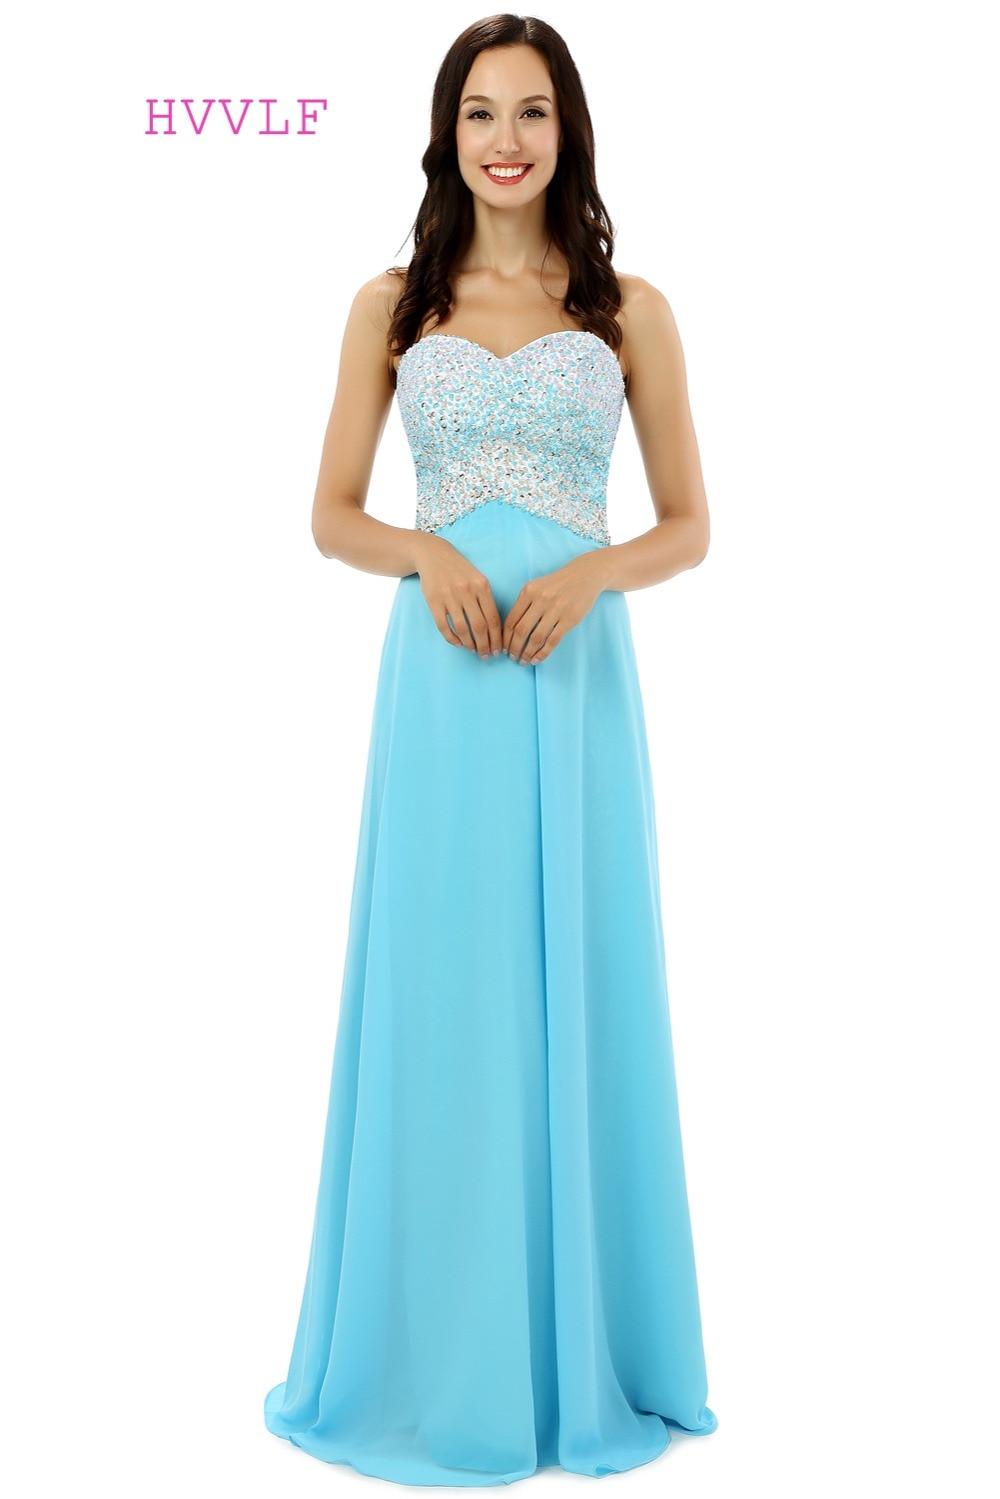 Maternity prom dress prom dress for pregant women - Luxurious Evening Dresses 2017 A Line Sweetheart Chiffon Beaded Sky Blue Women Maternity Long Evening